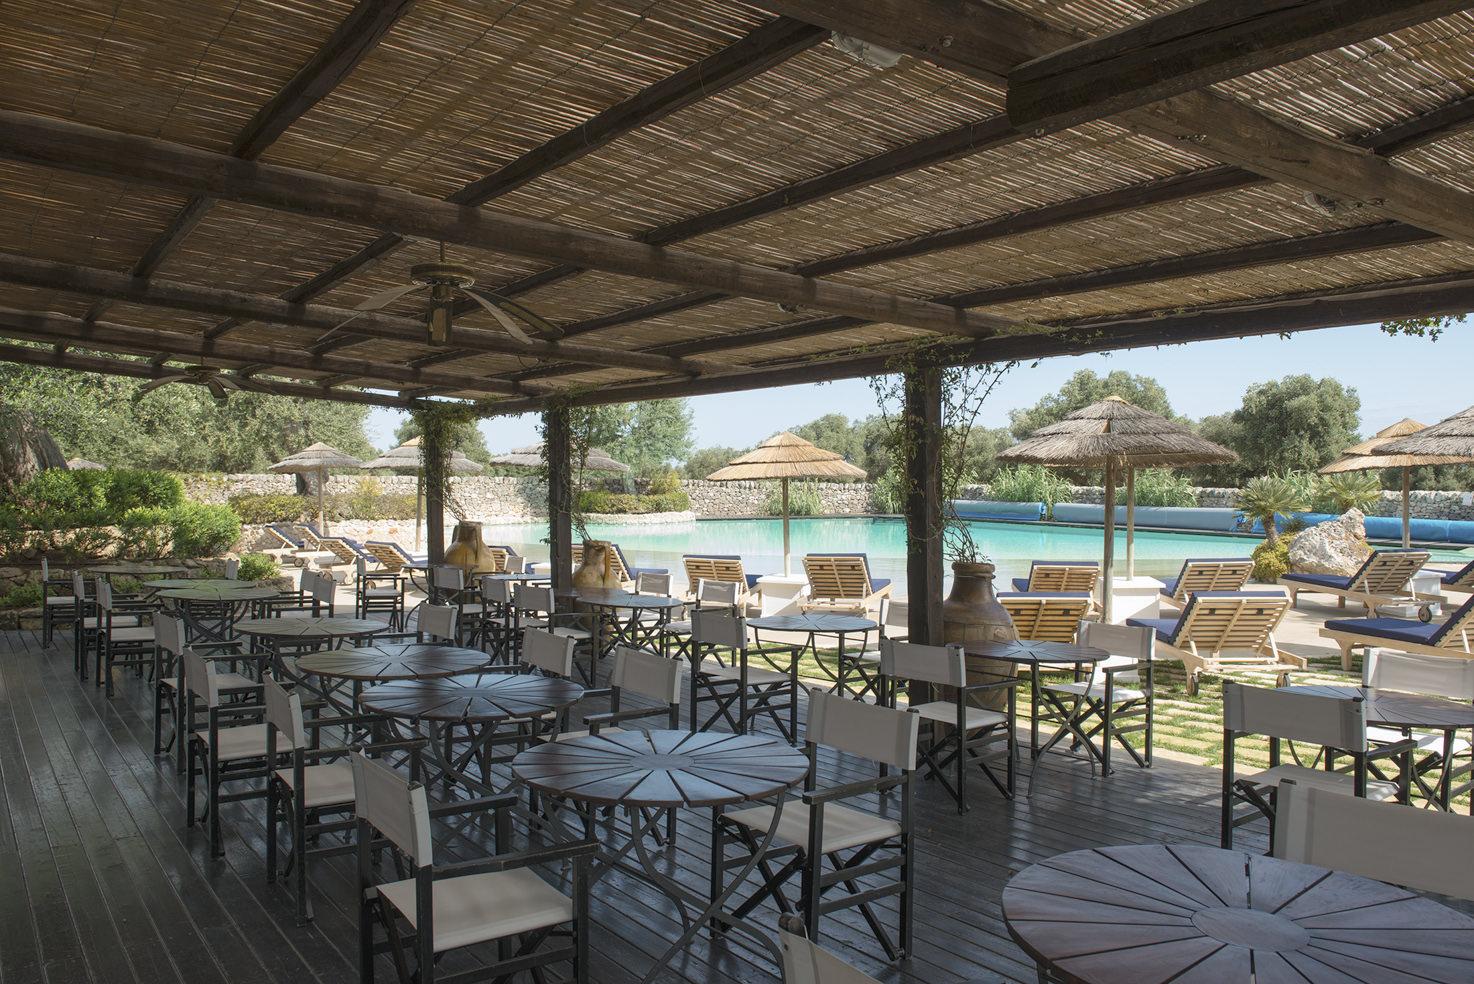 Pool restaurant at Torre Coccaro